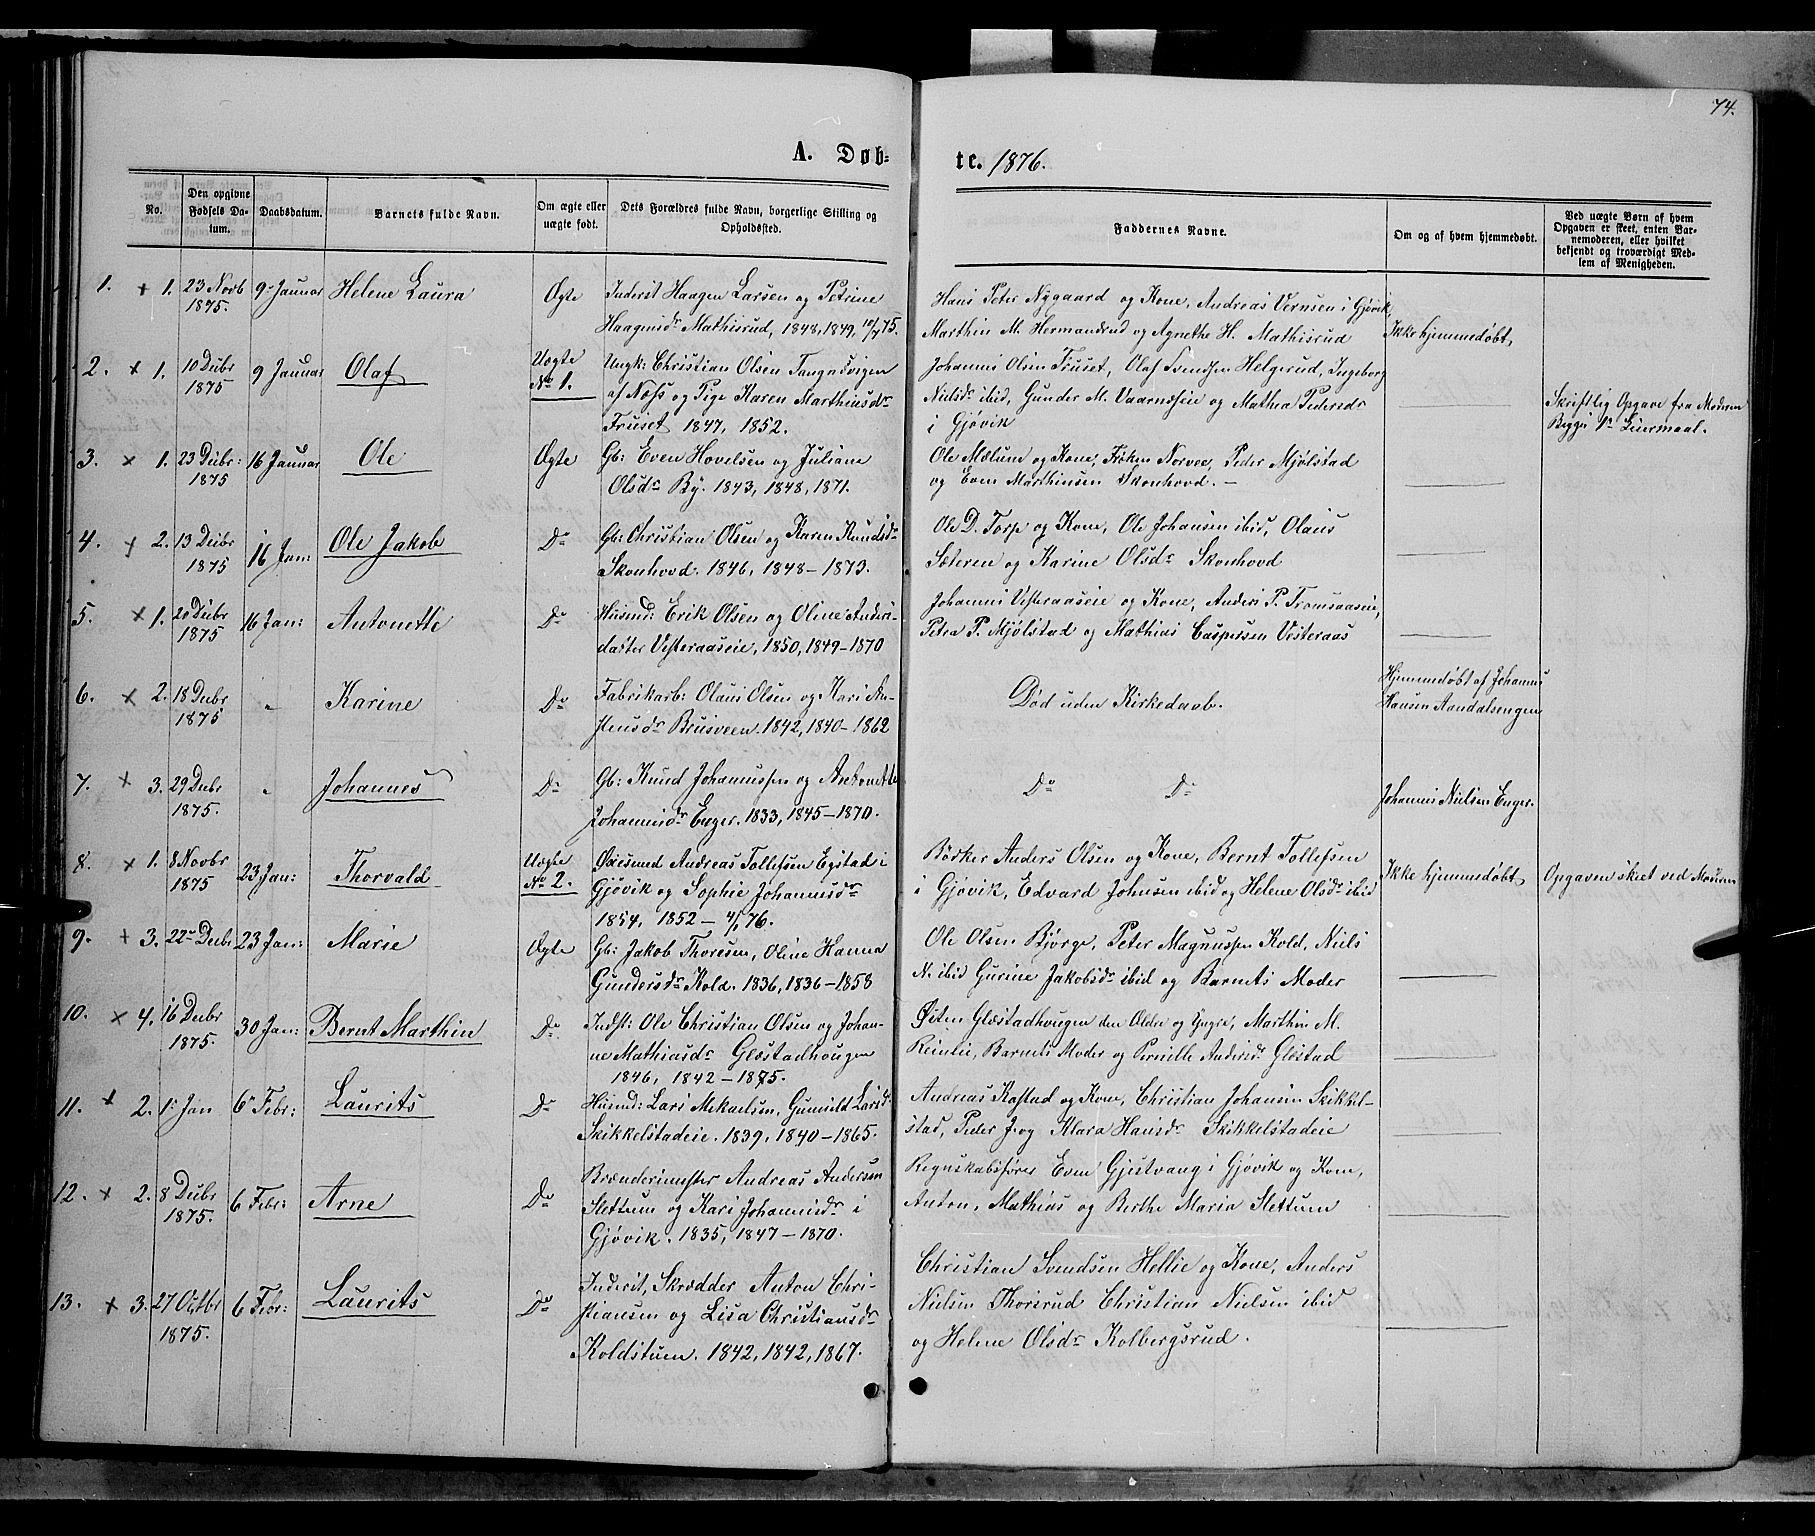 SAH, Vardal prestekontor, H/Ha/Hab/L0006: Klokkerbok nr. 6, 1869-1881, s. 74